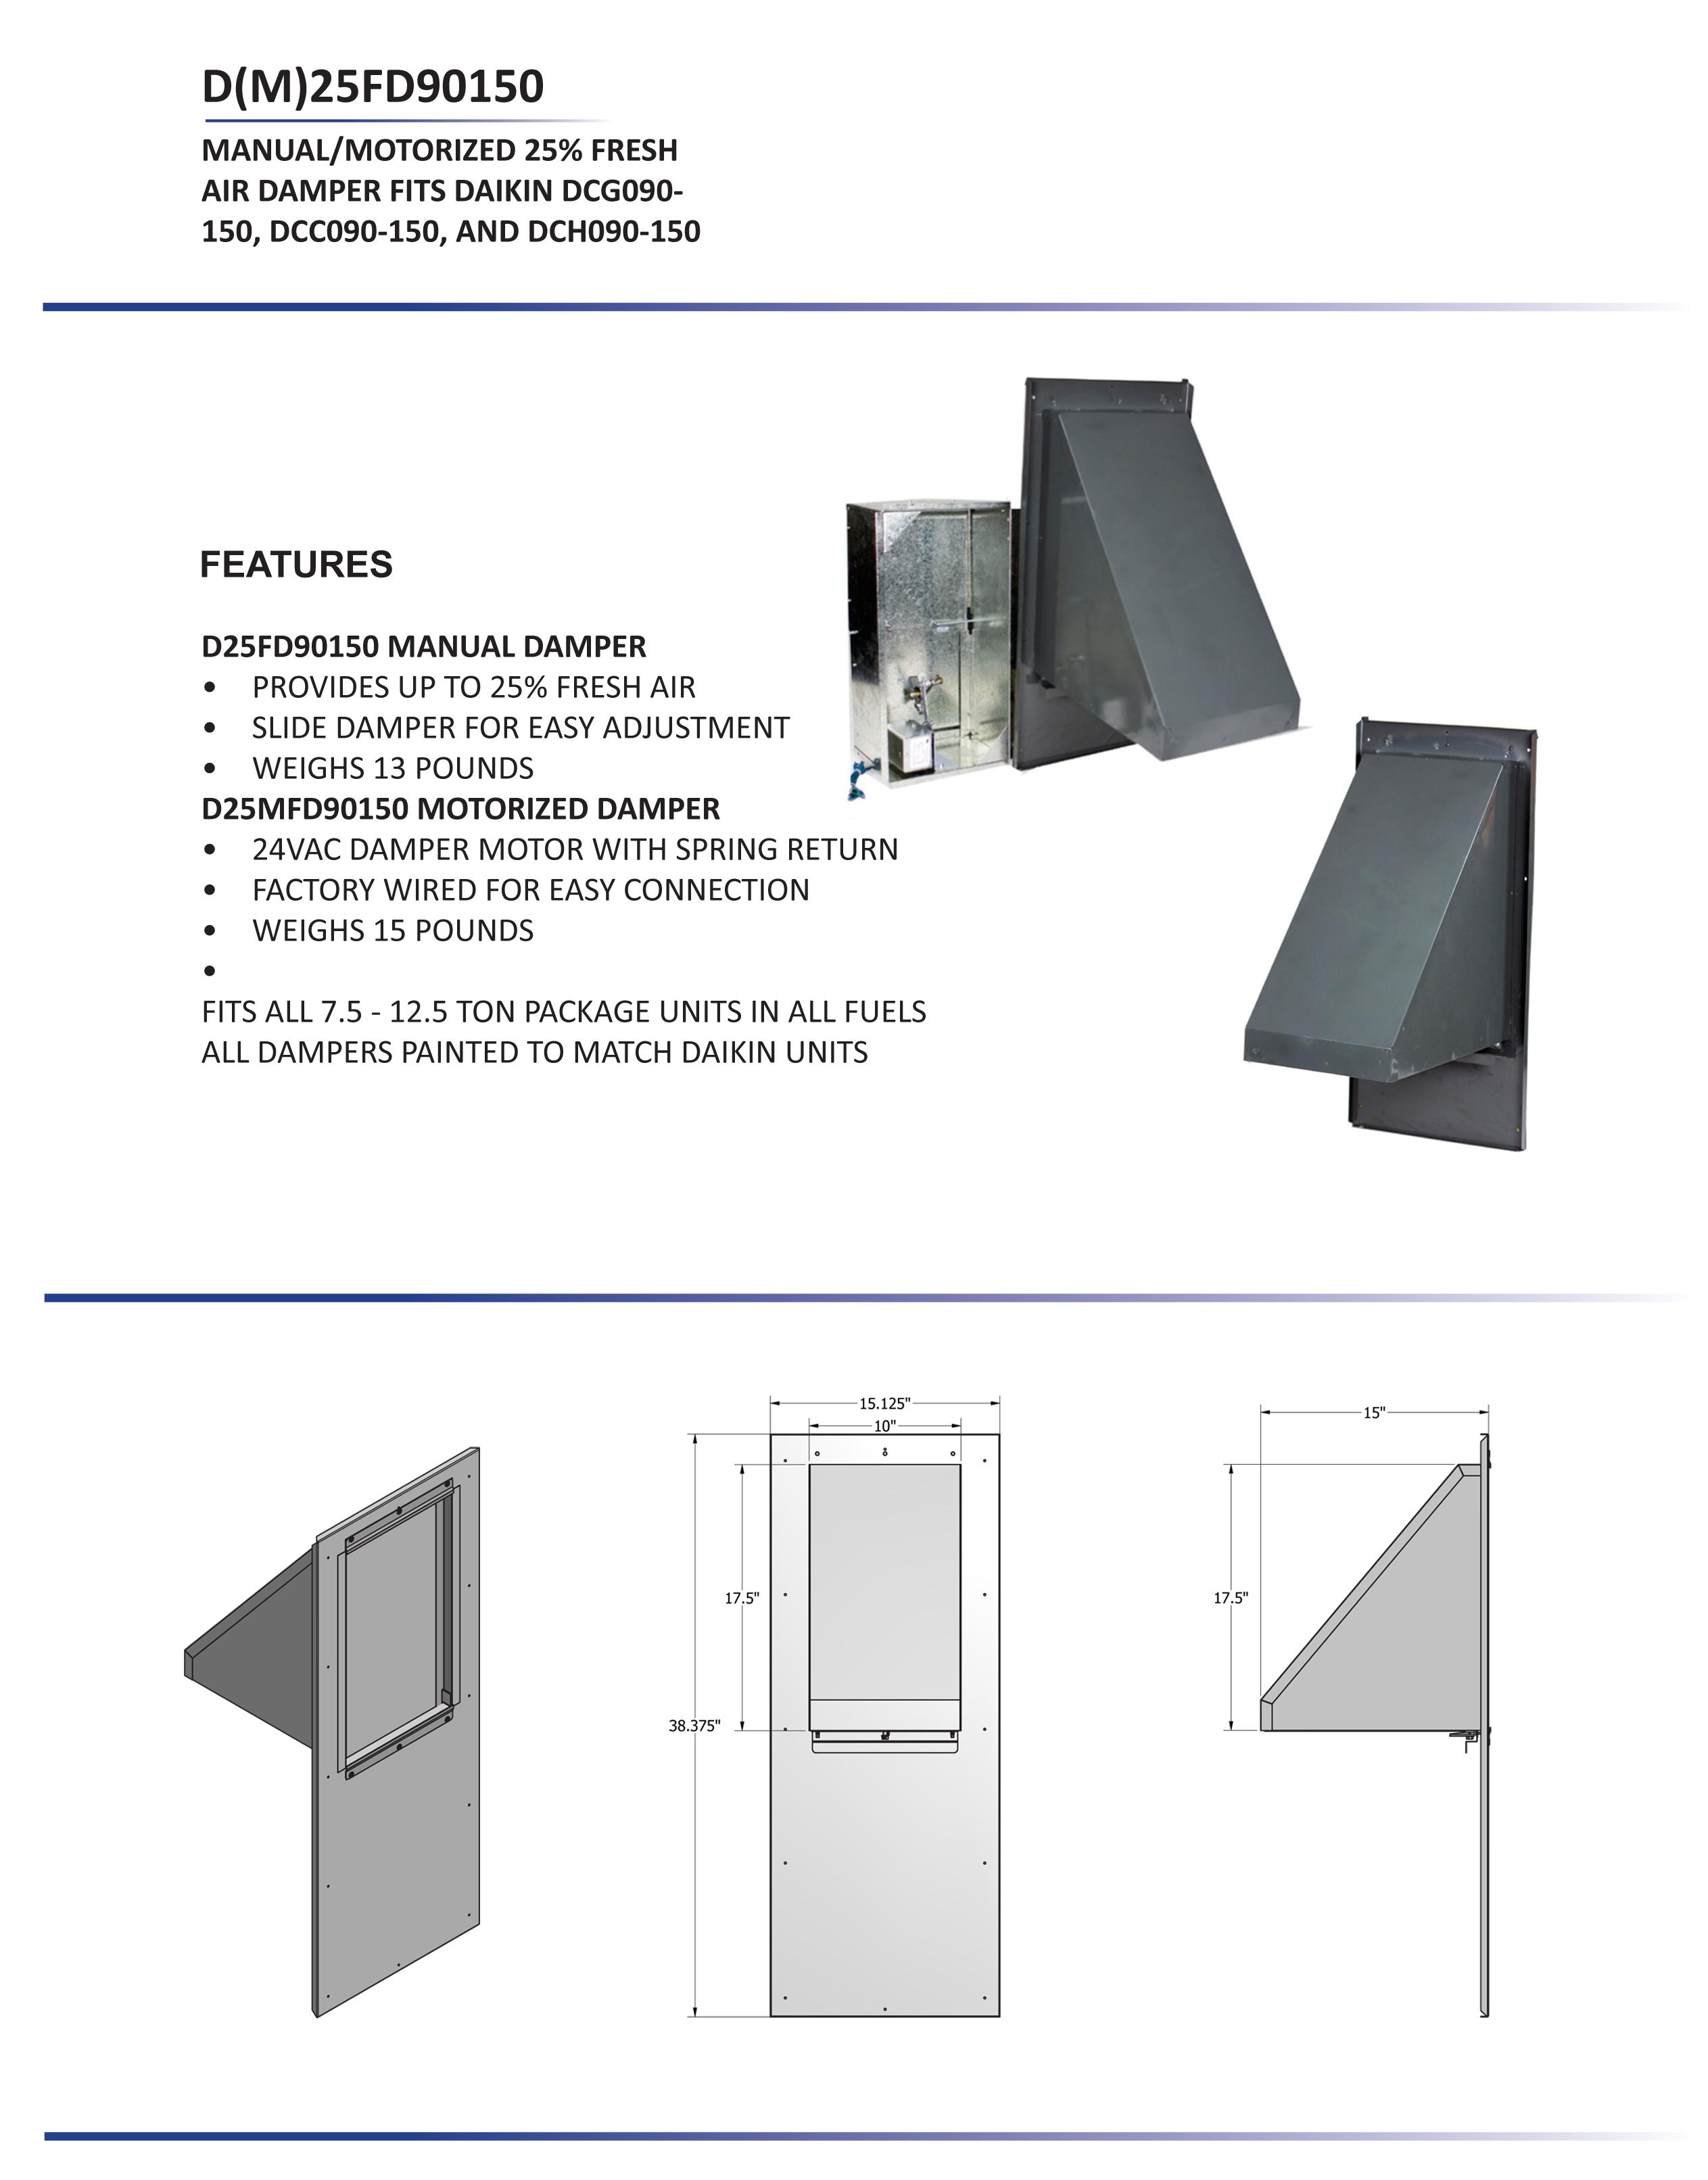 7 5 12 5 ton daikin 25 manual fresh air damper dcc dcg dch rh budgetheating com Residential Electrical Wiring Diagrams Window Air Conditioner Wiring Diagram